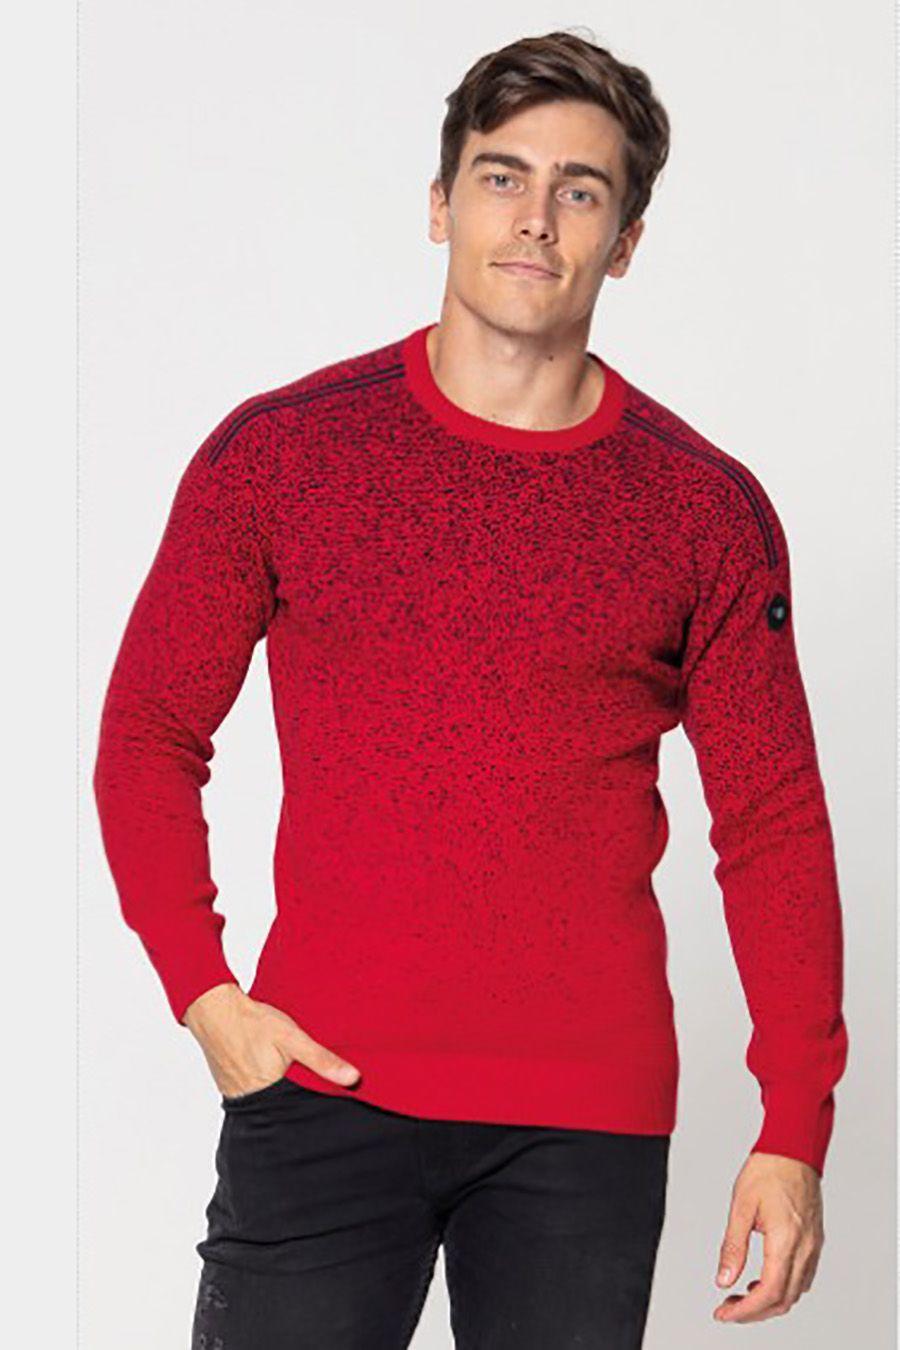 Джемпер (свитер) мужской Pooll Park 201415 Red - фото 1